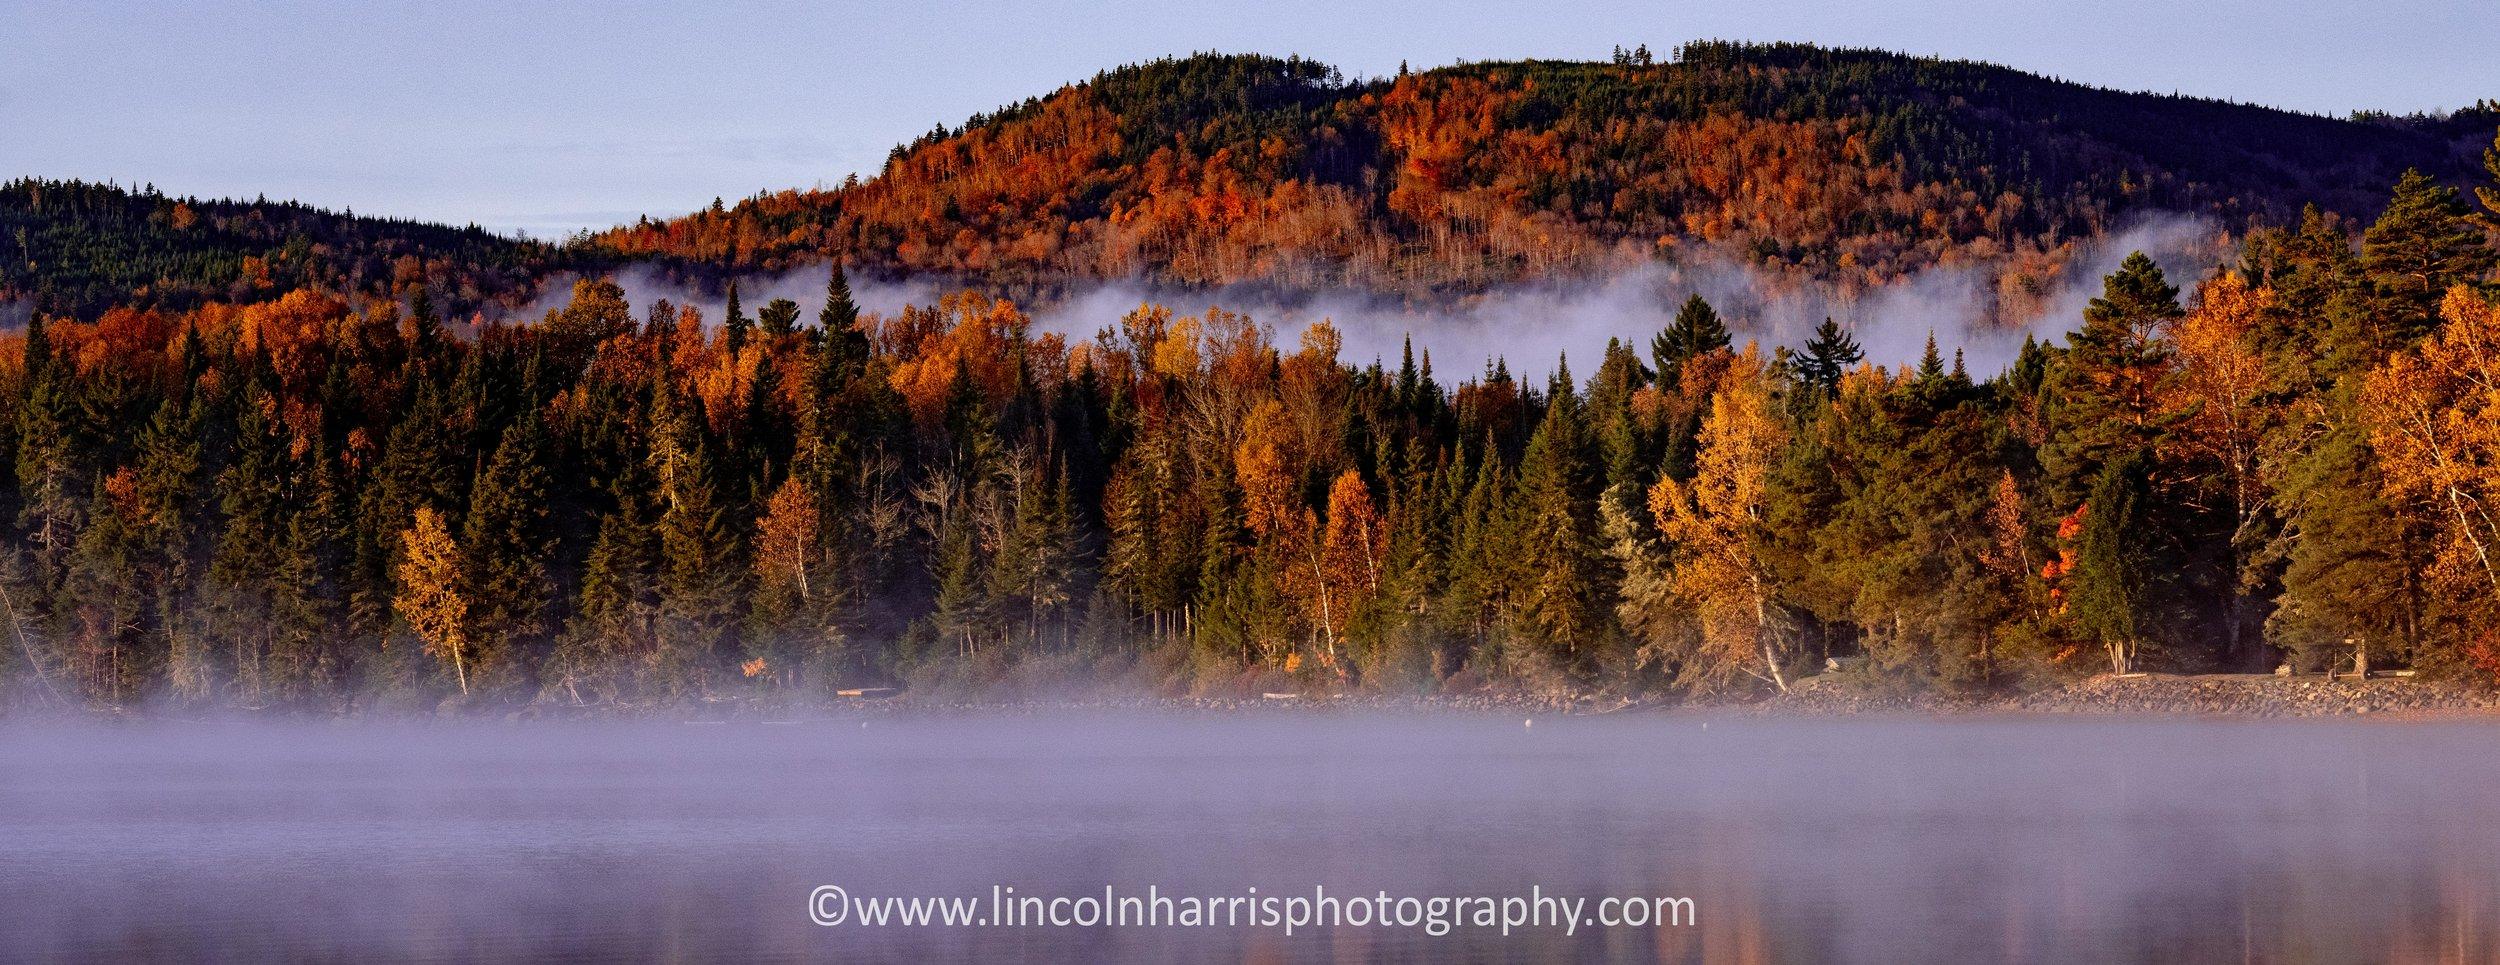 Fall Foliage Maine 13.jpg